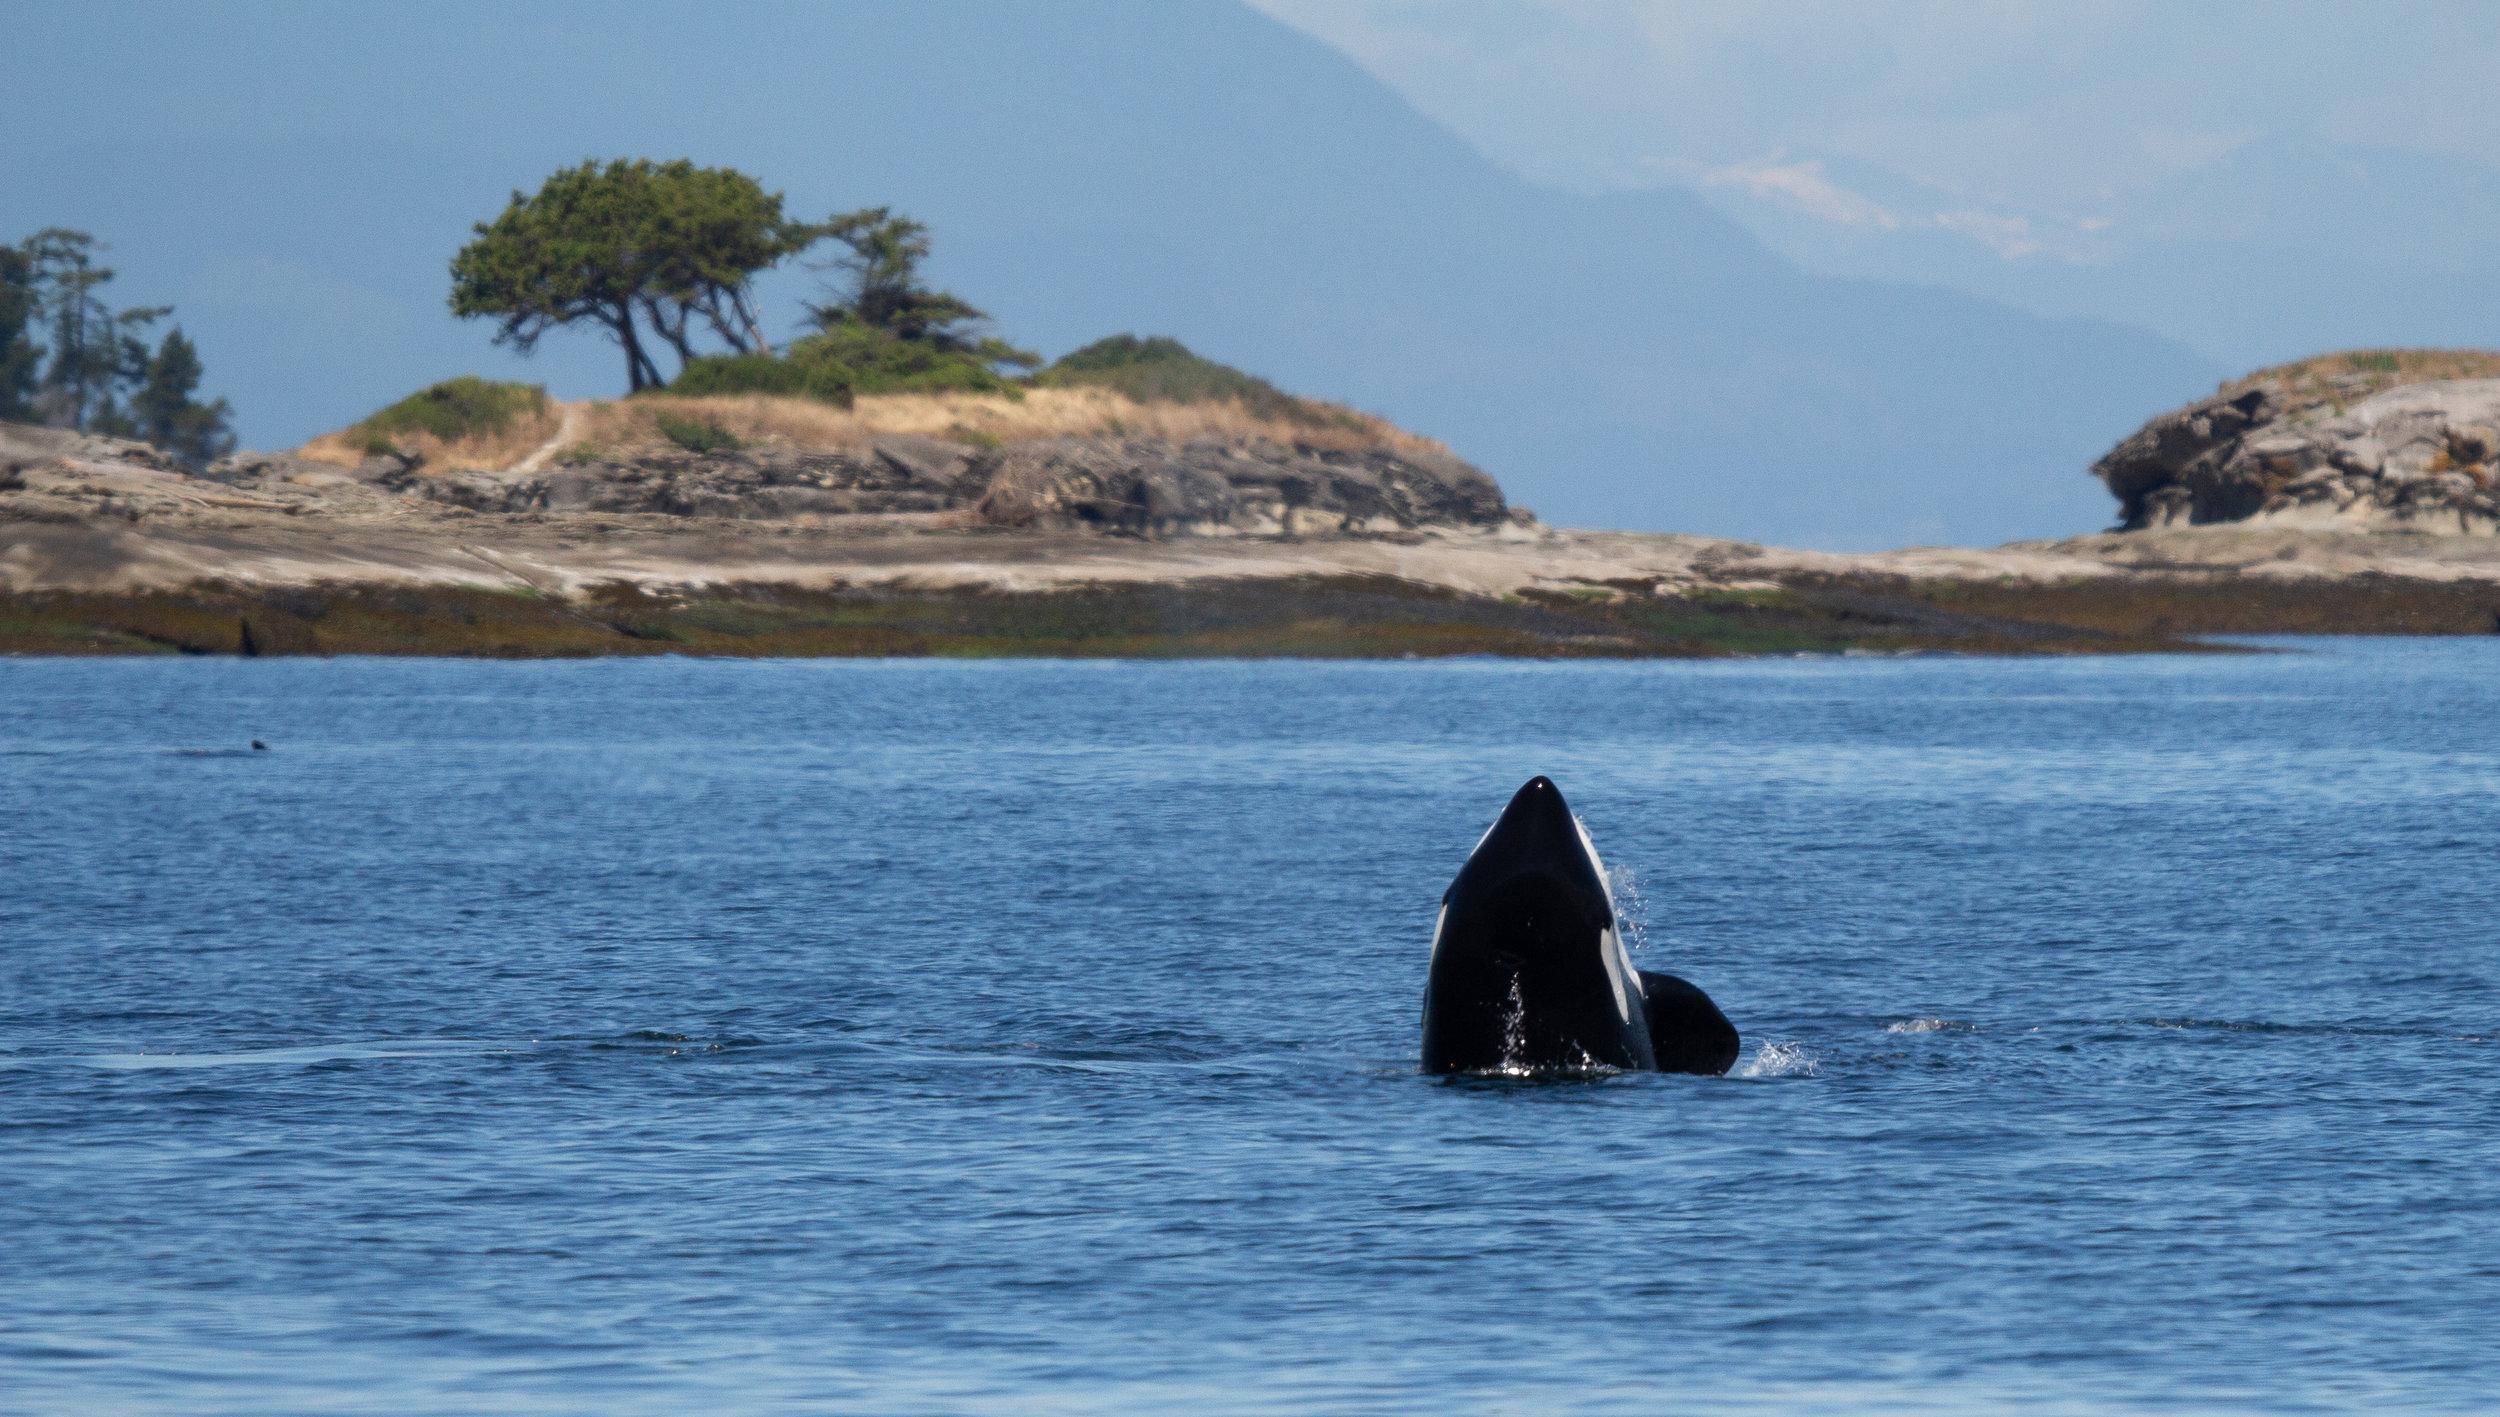 Orca spy hopping! Photo by Natalie Reichenbacher